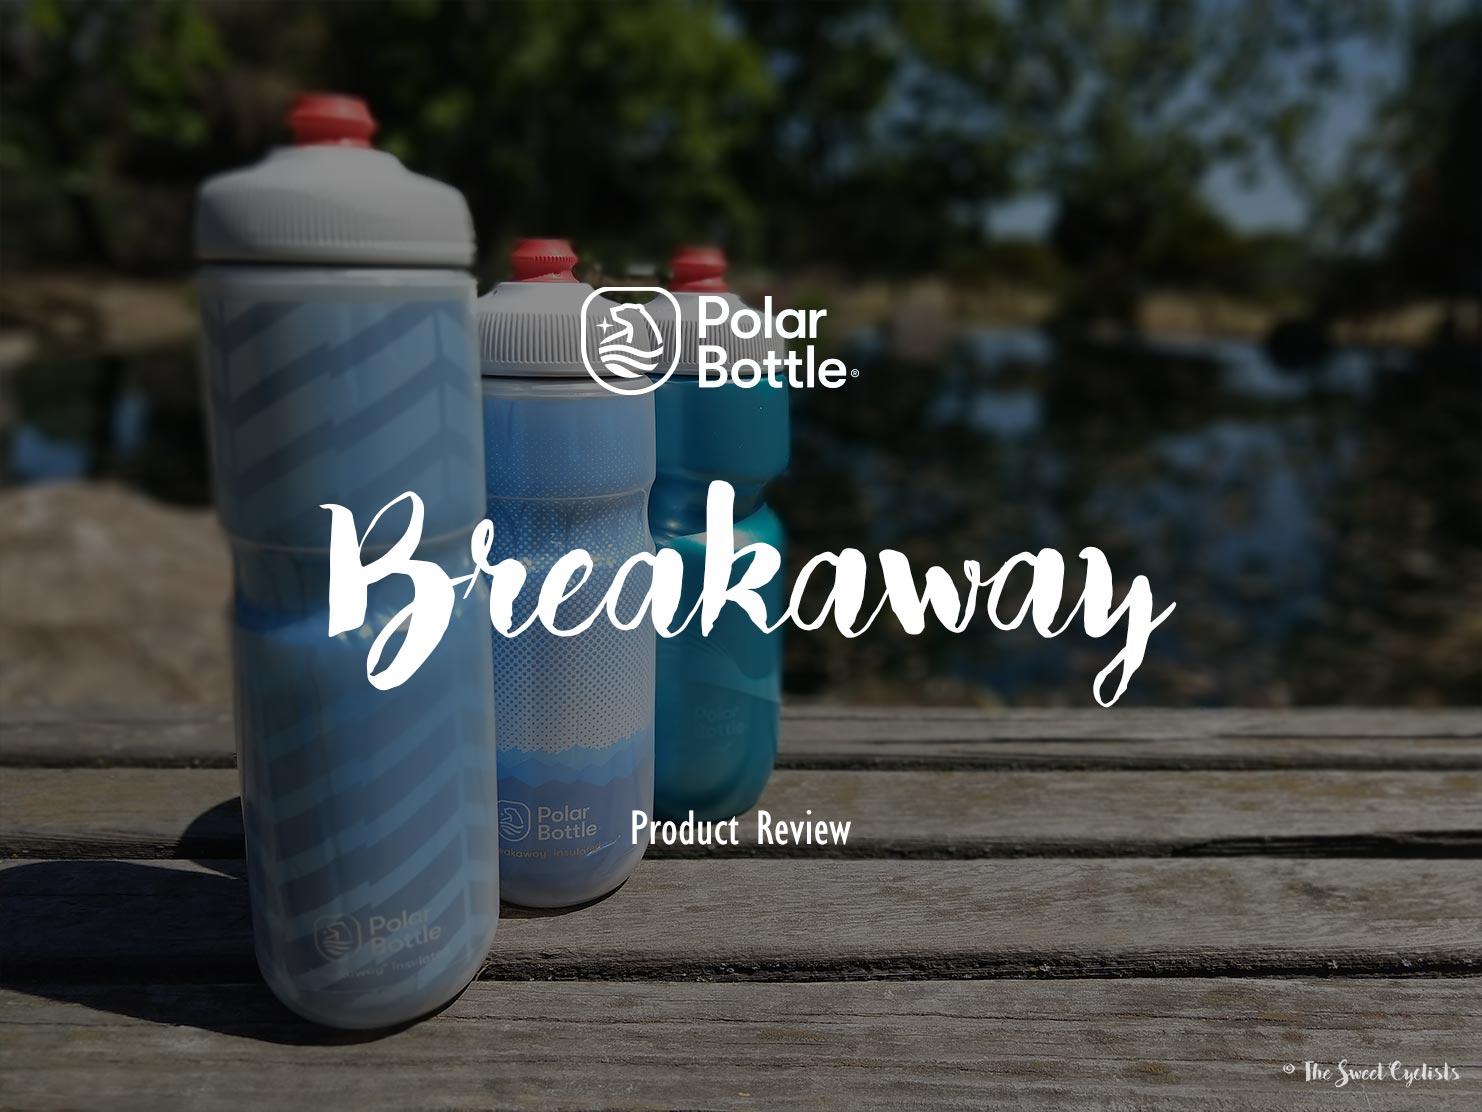 The snazzy new Polar Breakaway Bottles